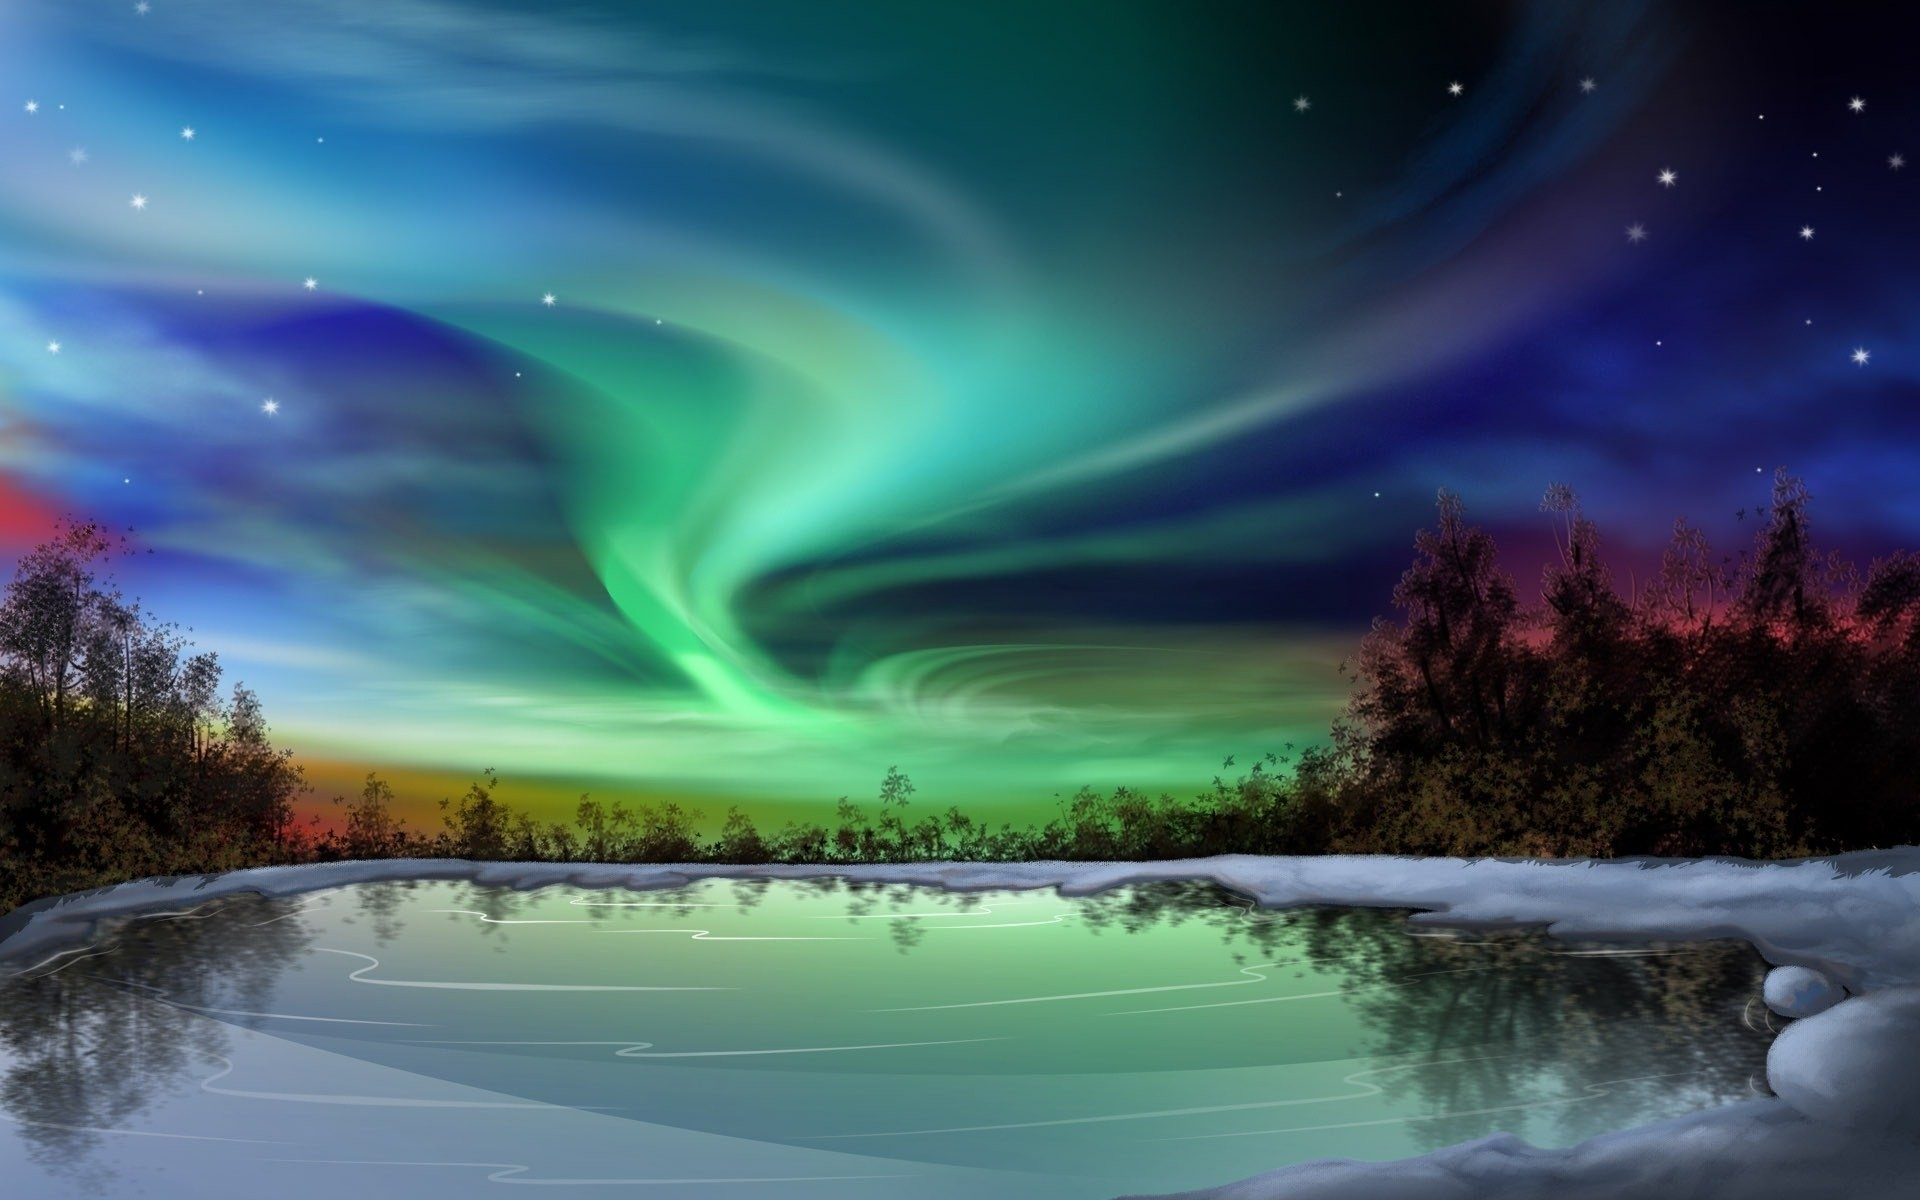 Aurora Borealis Hd Wallpaper 80 Images